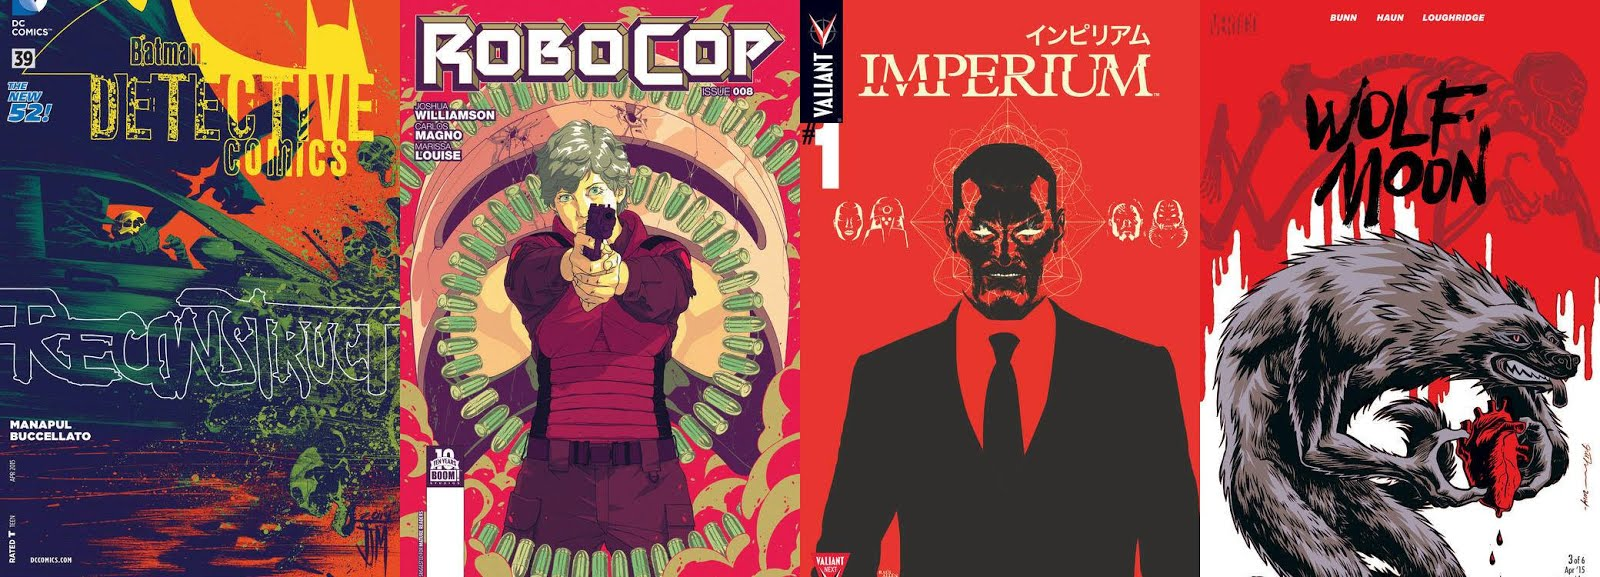 Empire-DCP-Minutemen-Scans  Comics CBR CBZ